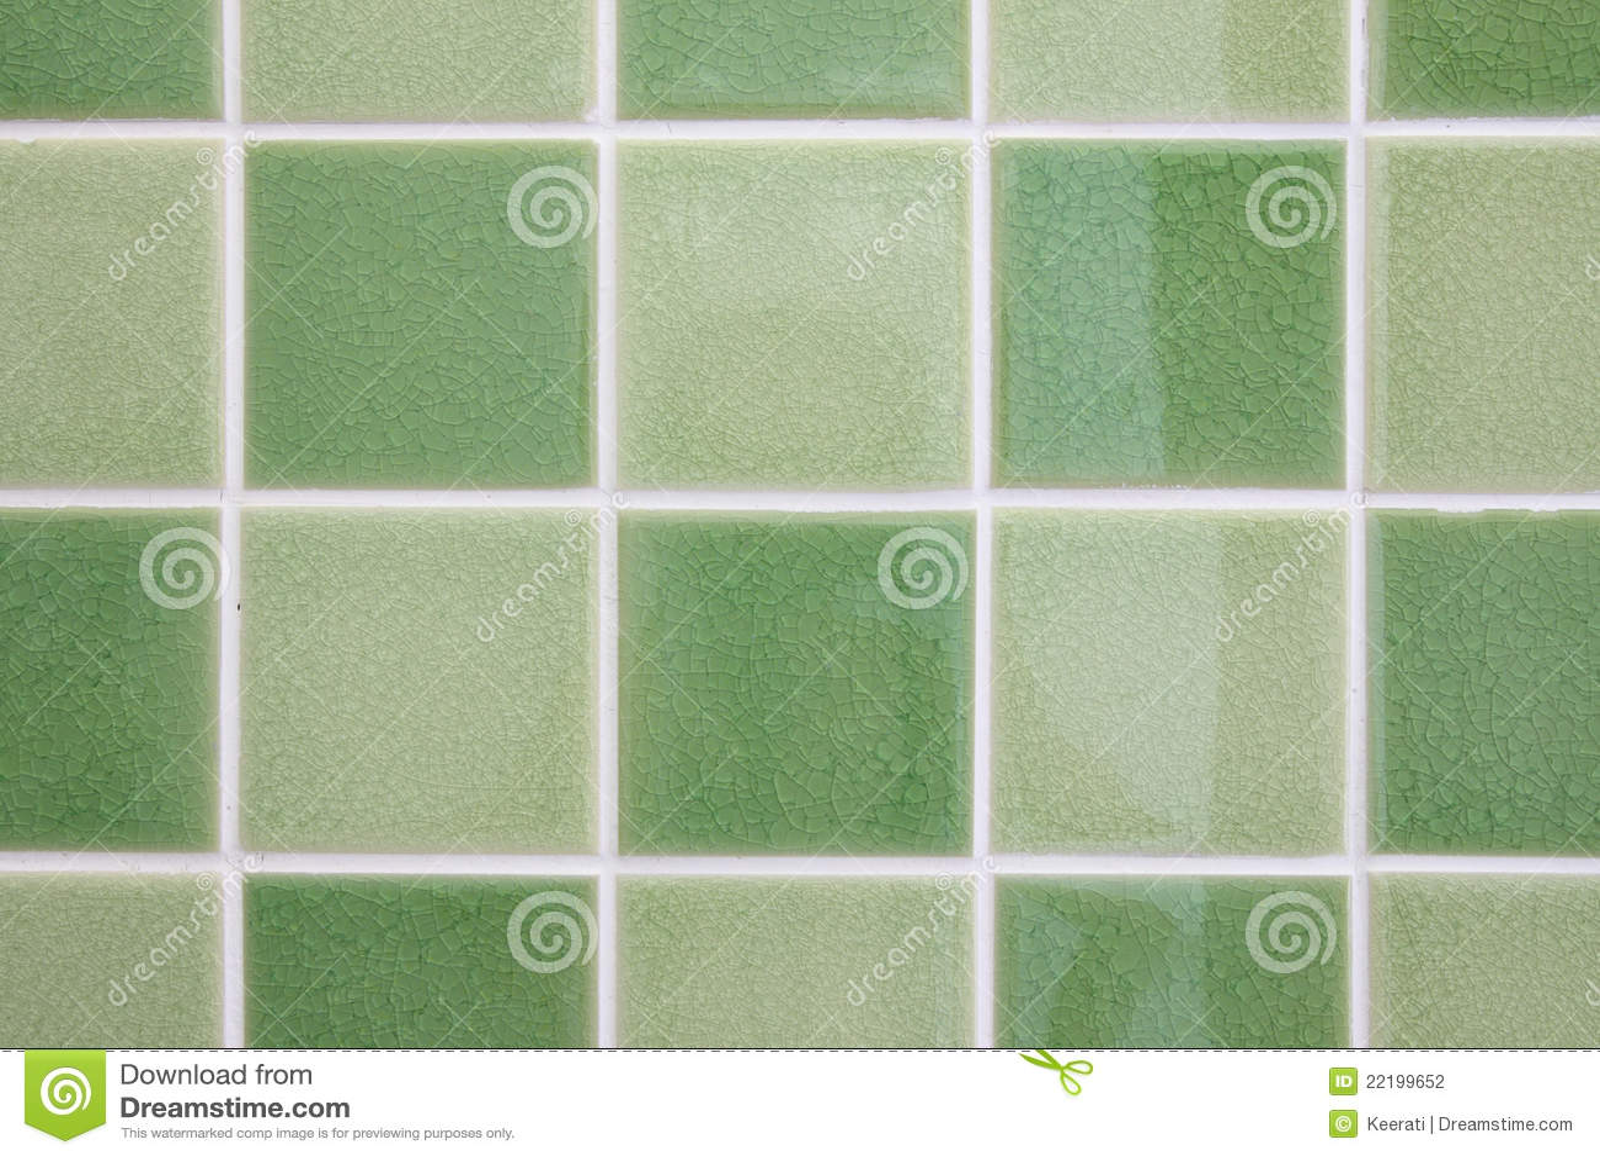 Imagenes De Baños Verdes:Green Mosaic Tiles